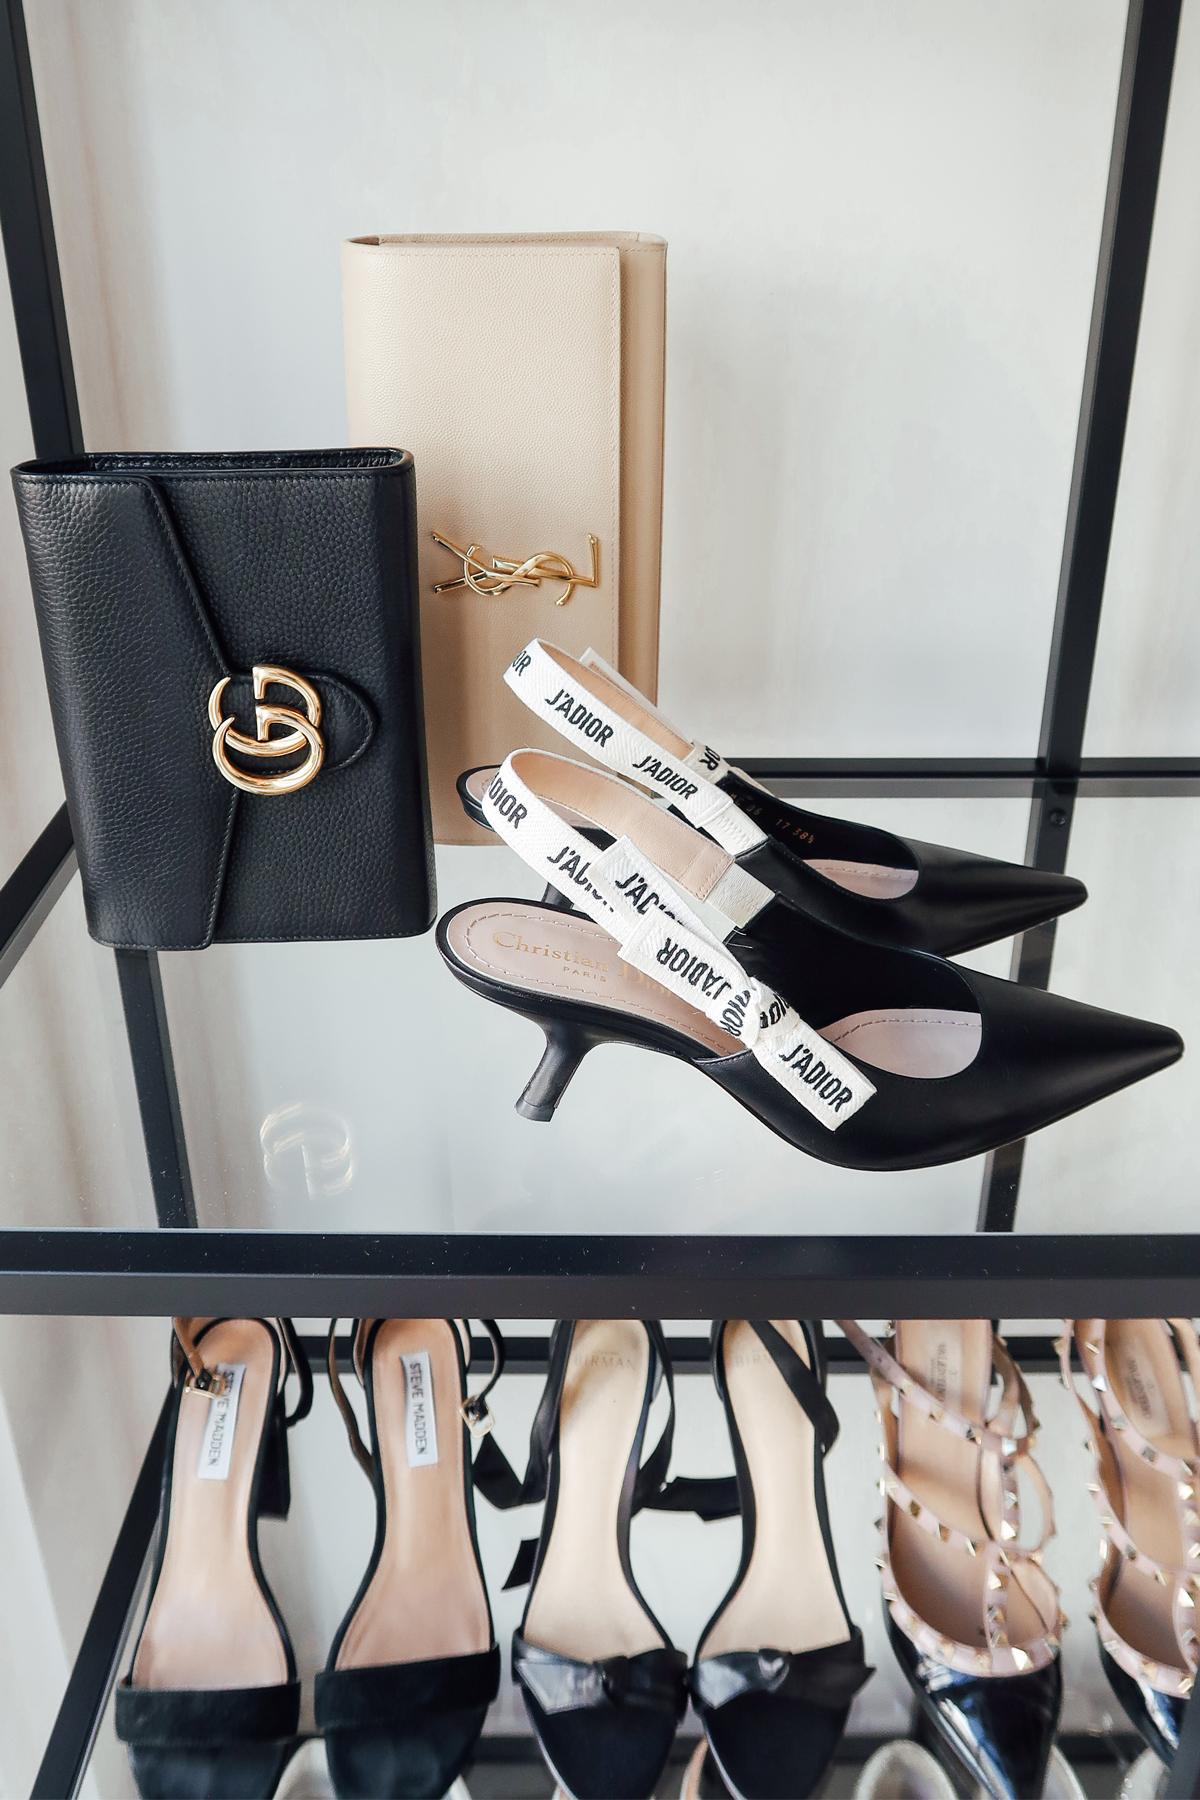 Fashion Jackson Handbag Shoe Collection Dior Jadior Slingbacks Gucci Black Clutch YSL Nude Clutch